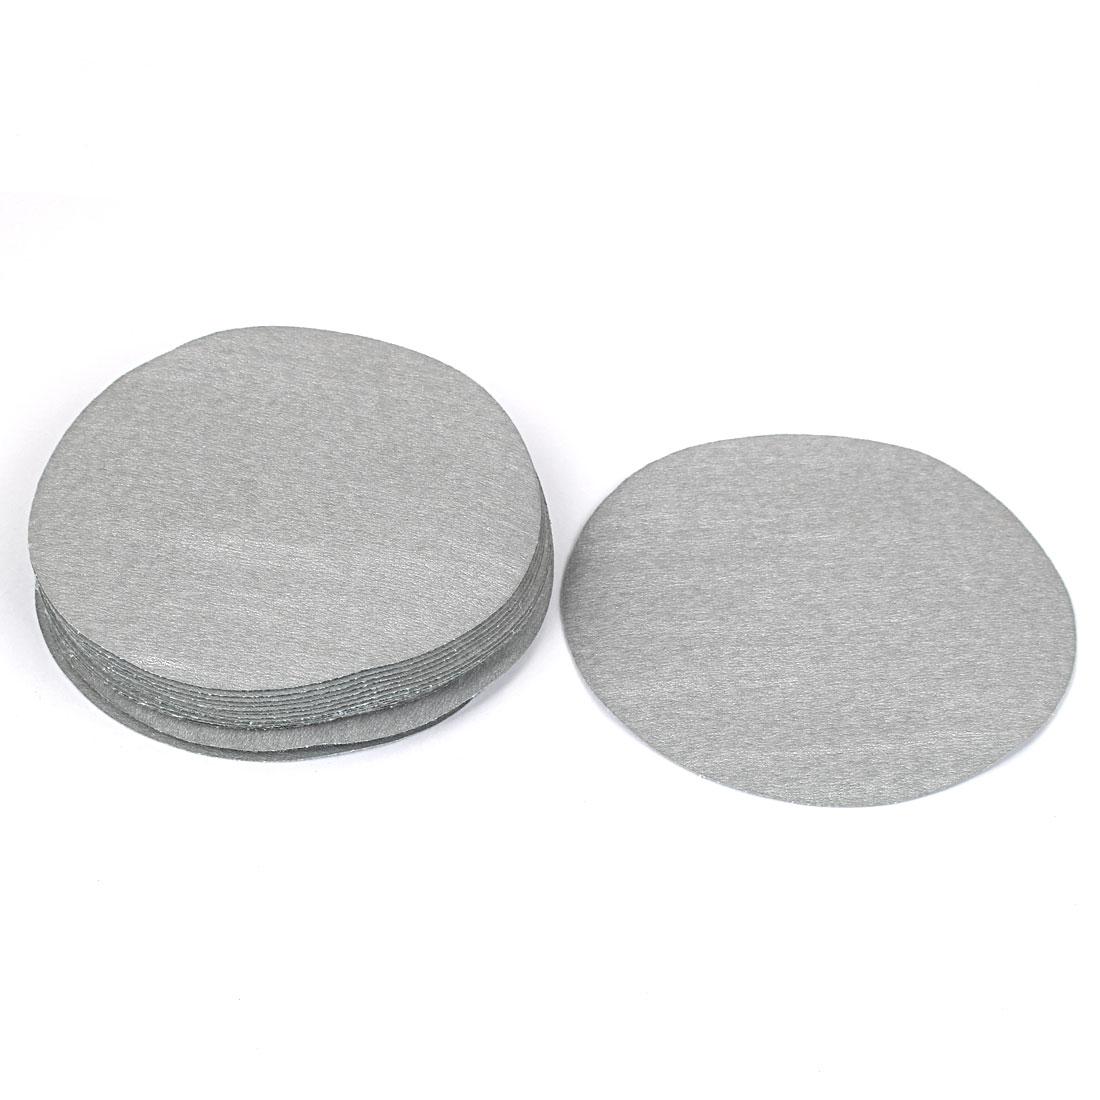 "5"" Dia Polishing Round Sanding Flocking Sandpaper Disc 800 Grit 20 Pcs"